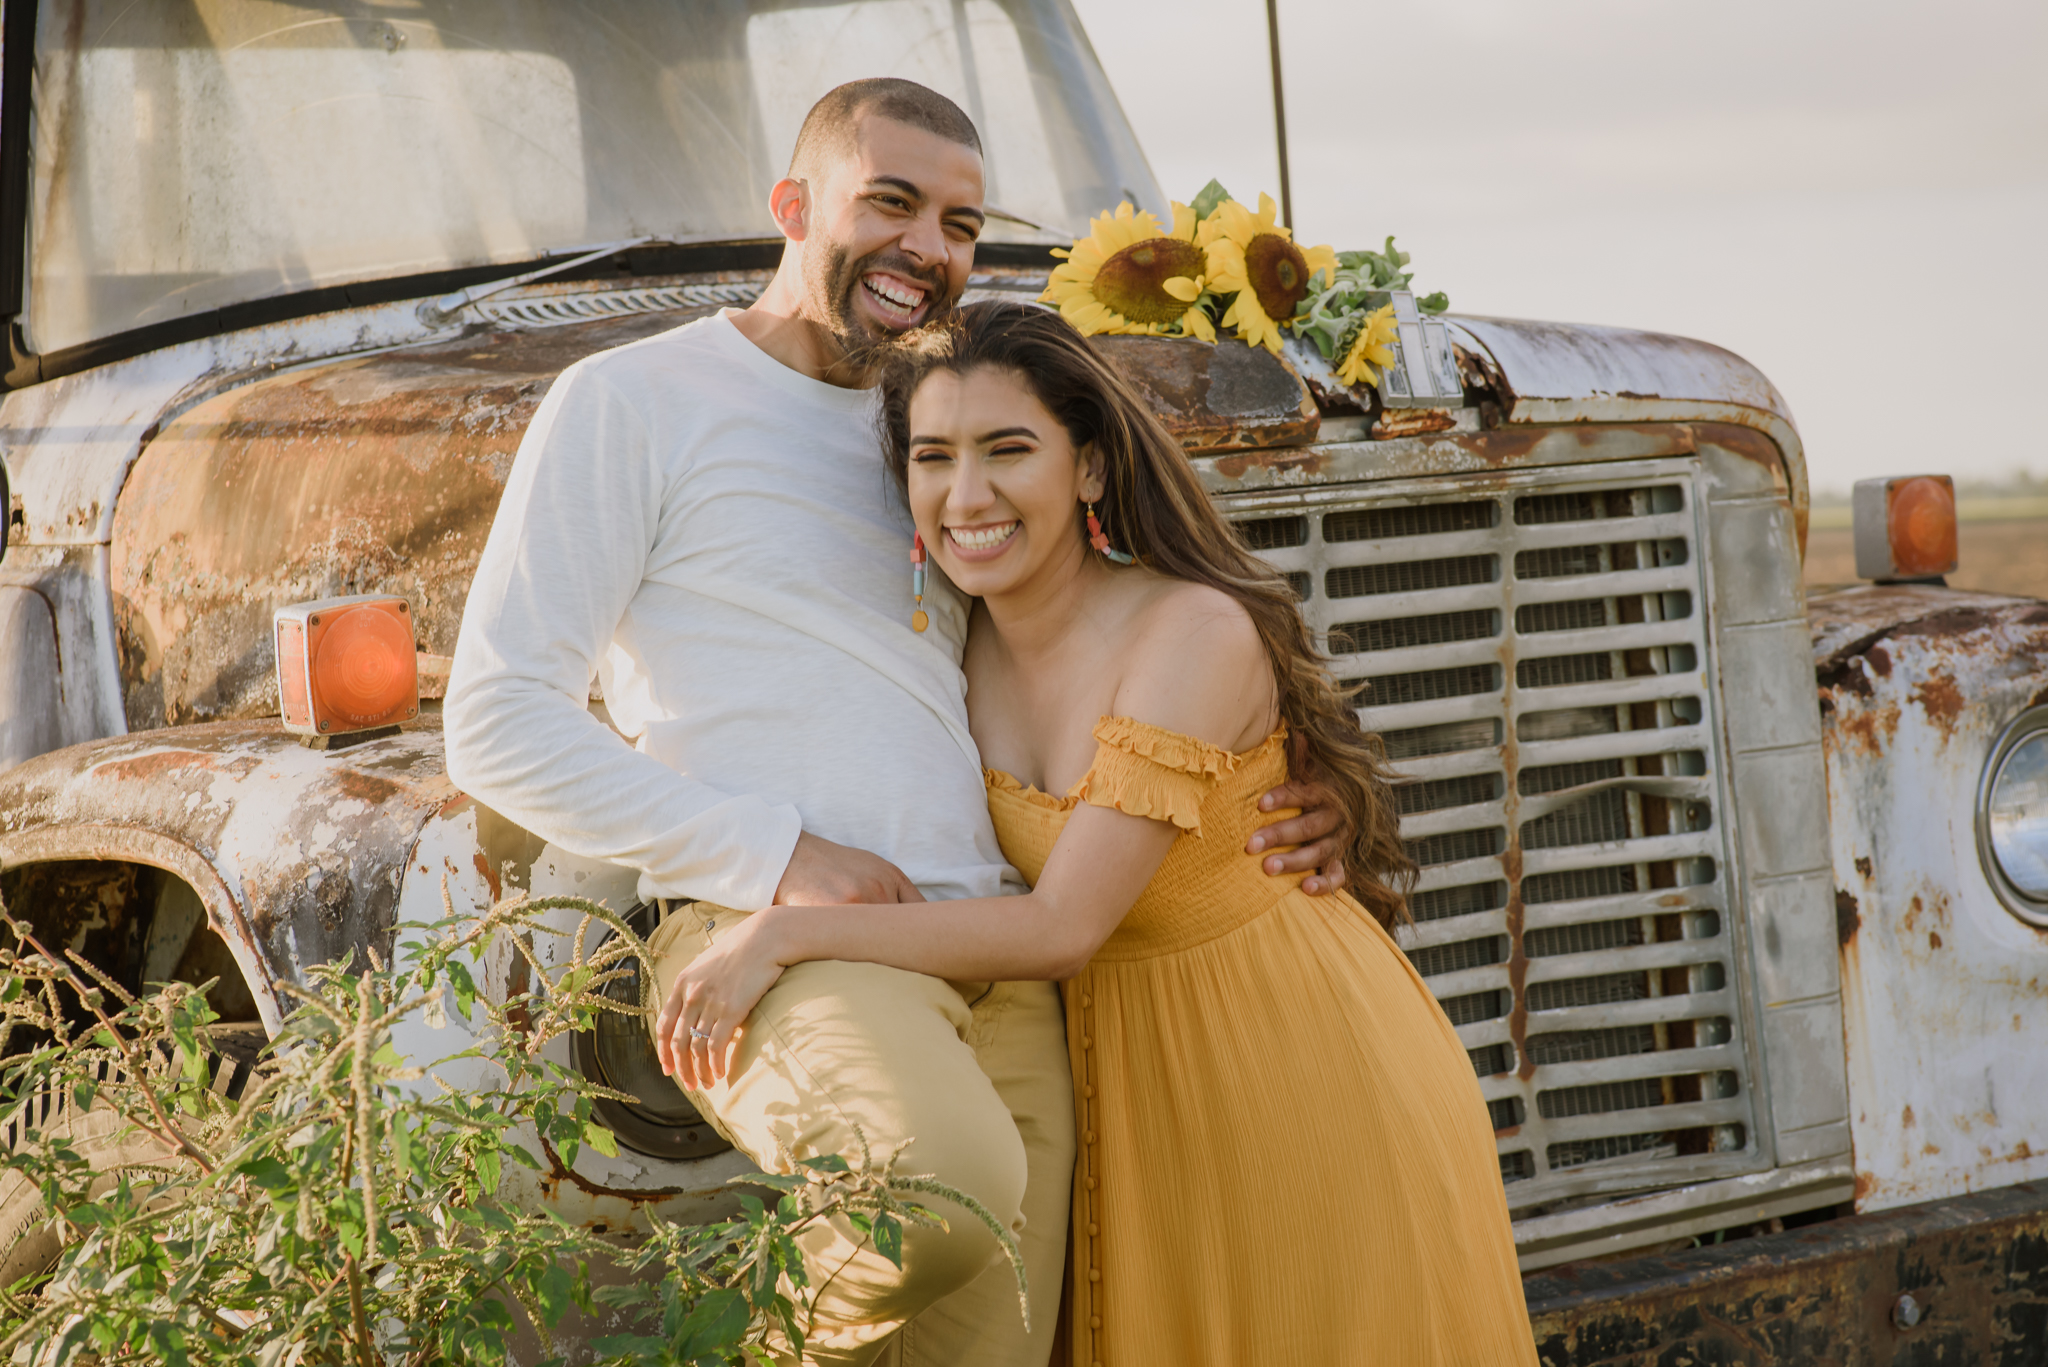 miami-sunflower-engagement-vanessa-and-johnny-photography-video-1-49.jpg